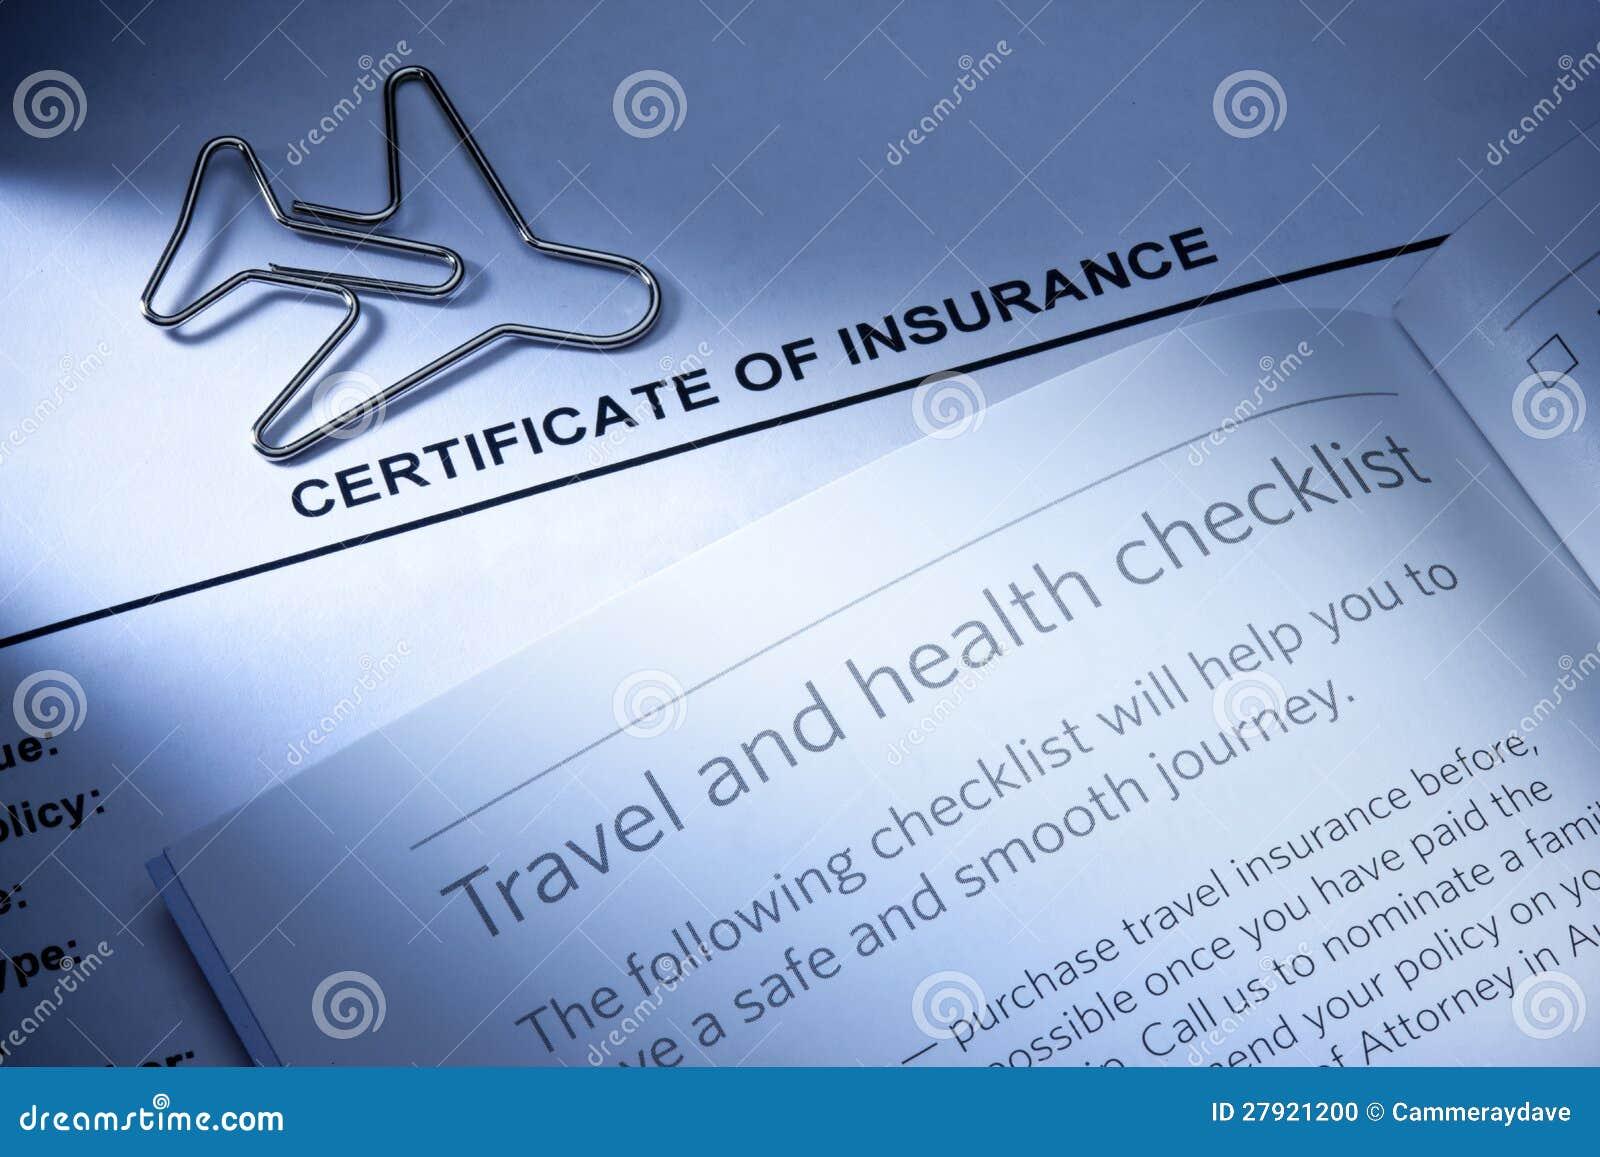 Travel Insurance Covers Mugging